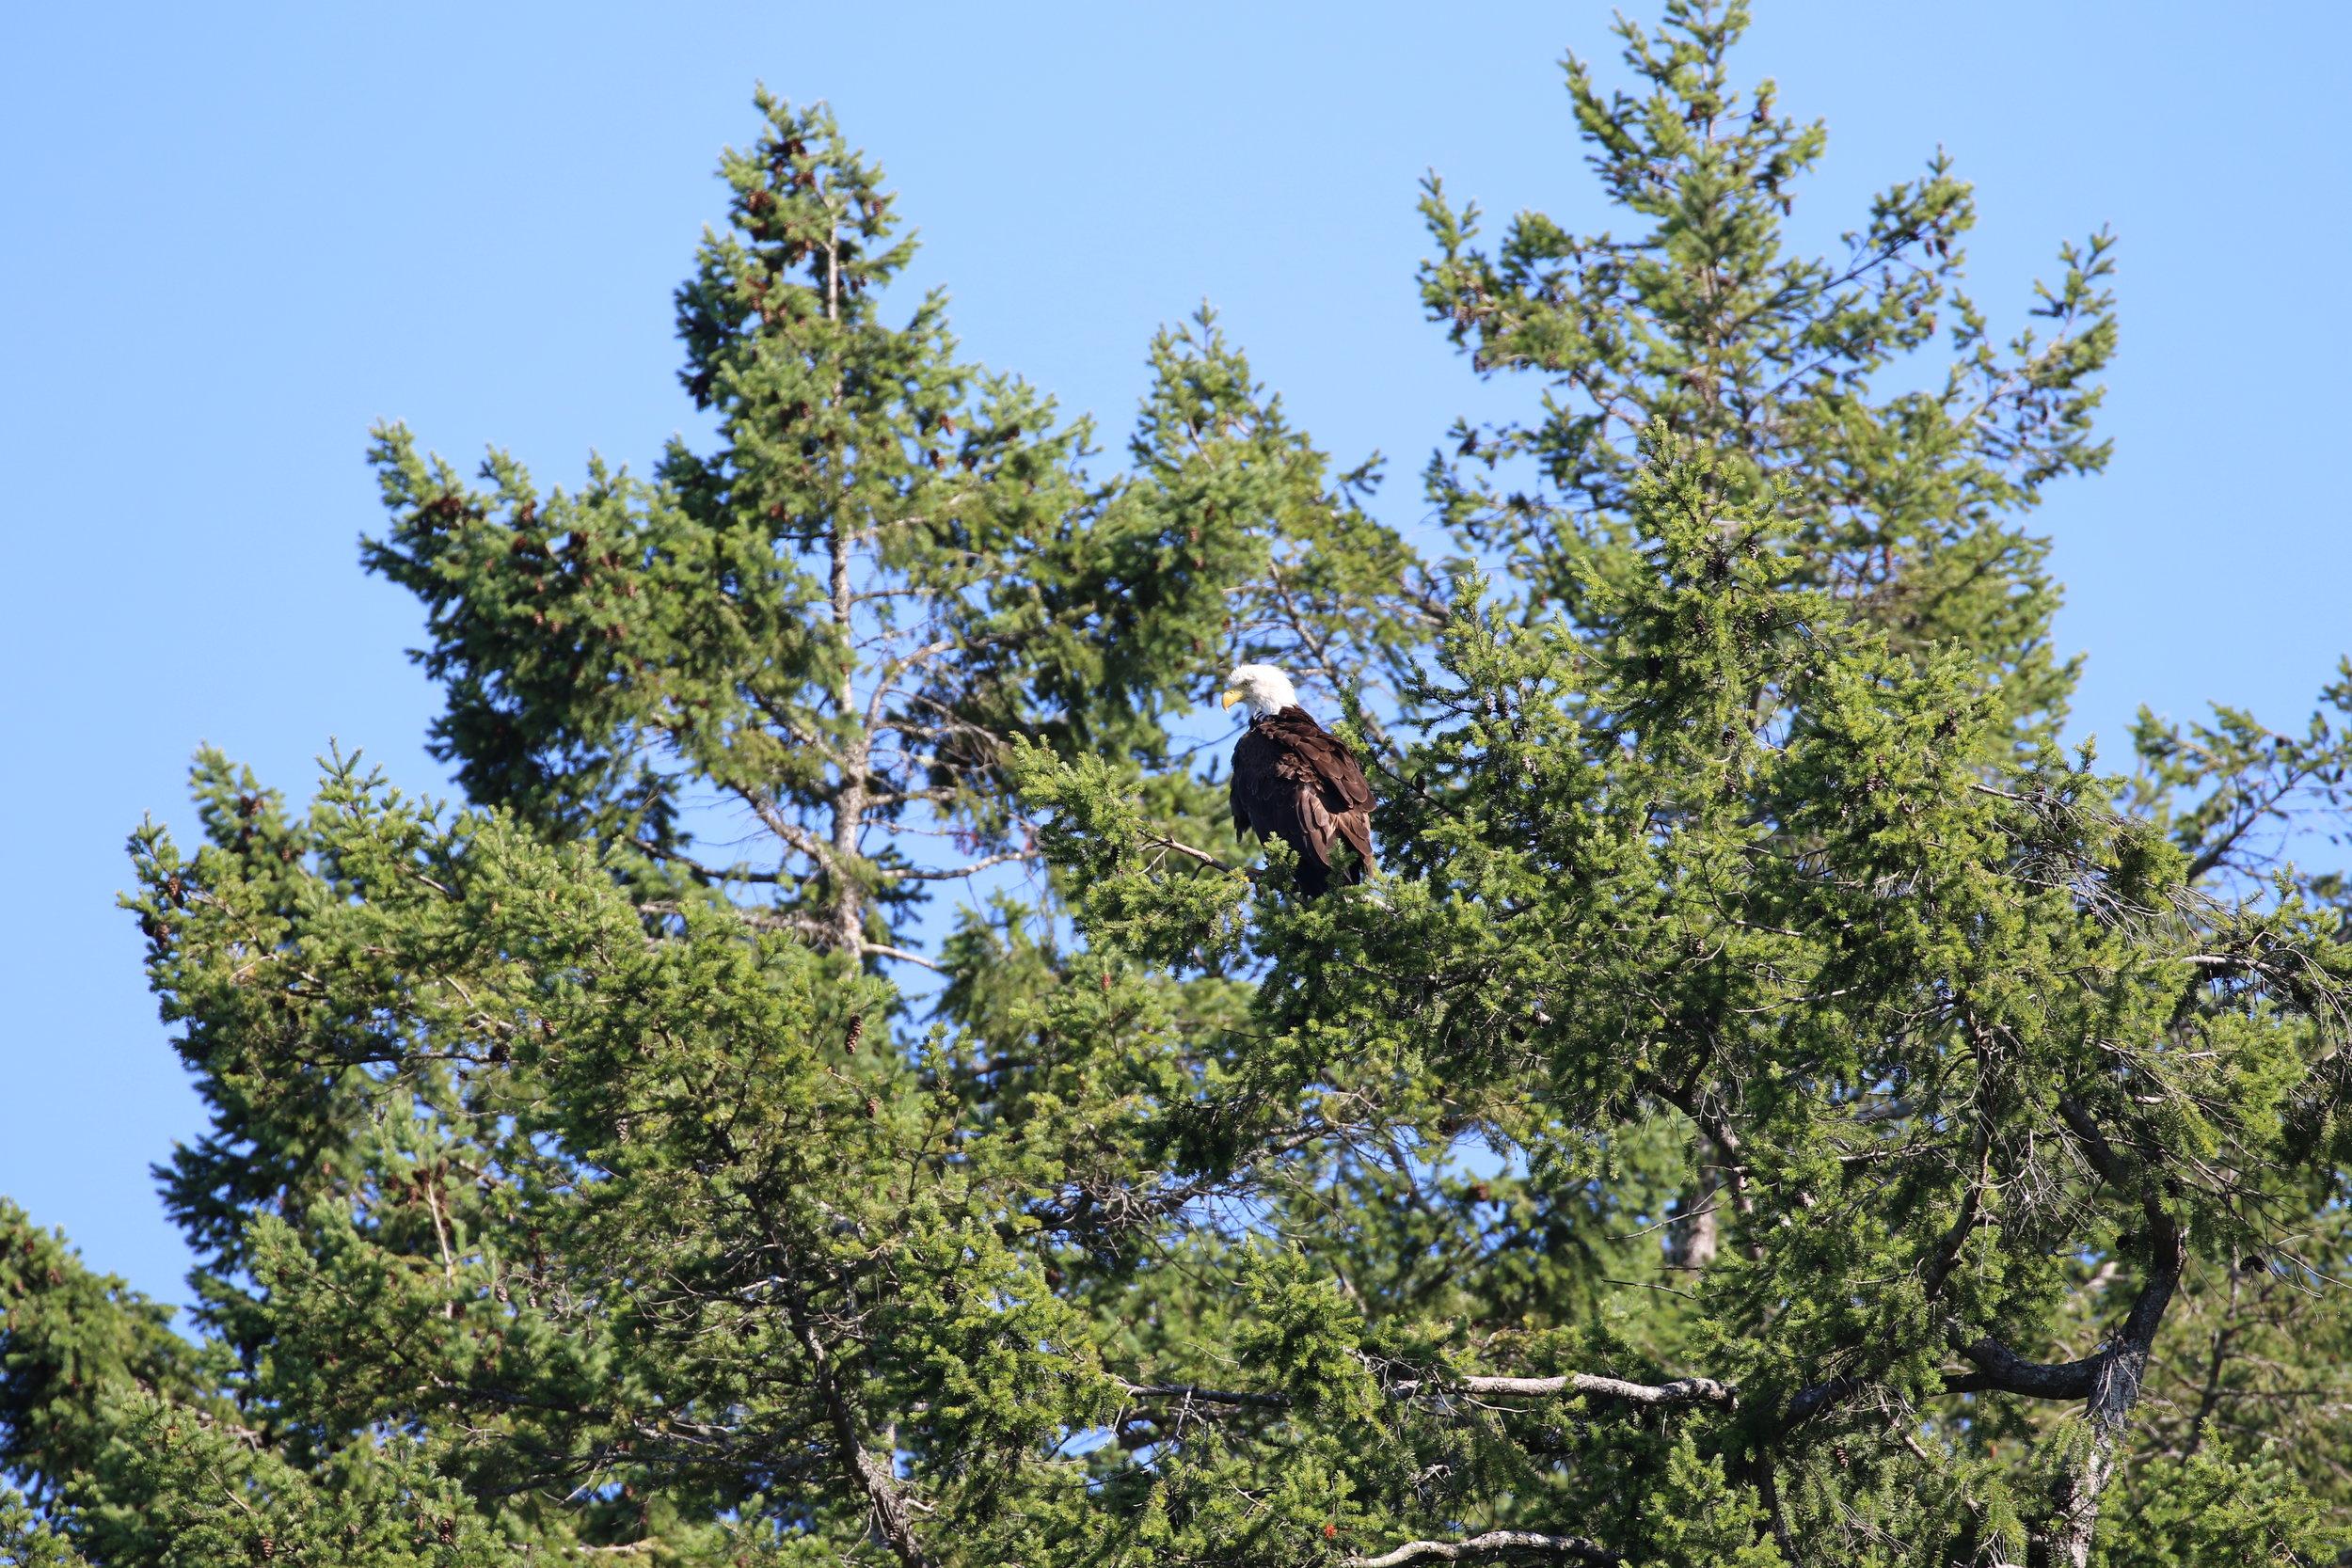 Perched bald eagle. Photo by Ryan Uslu (3:30).